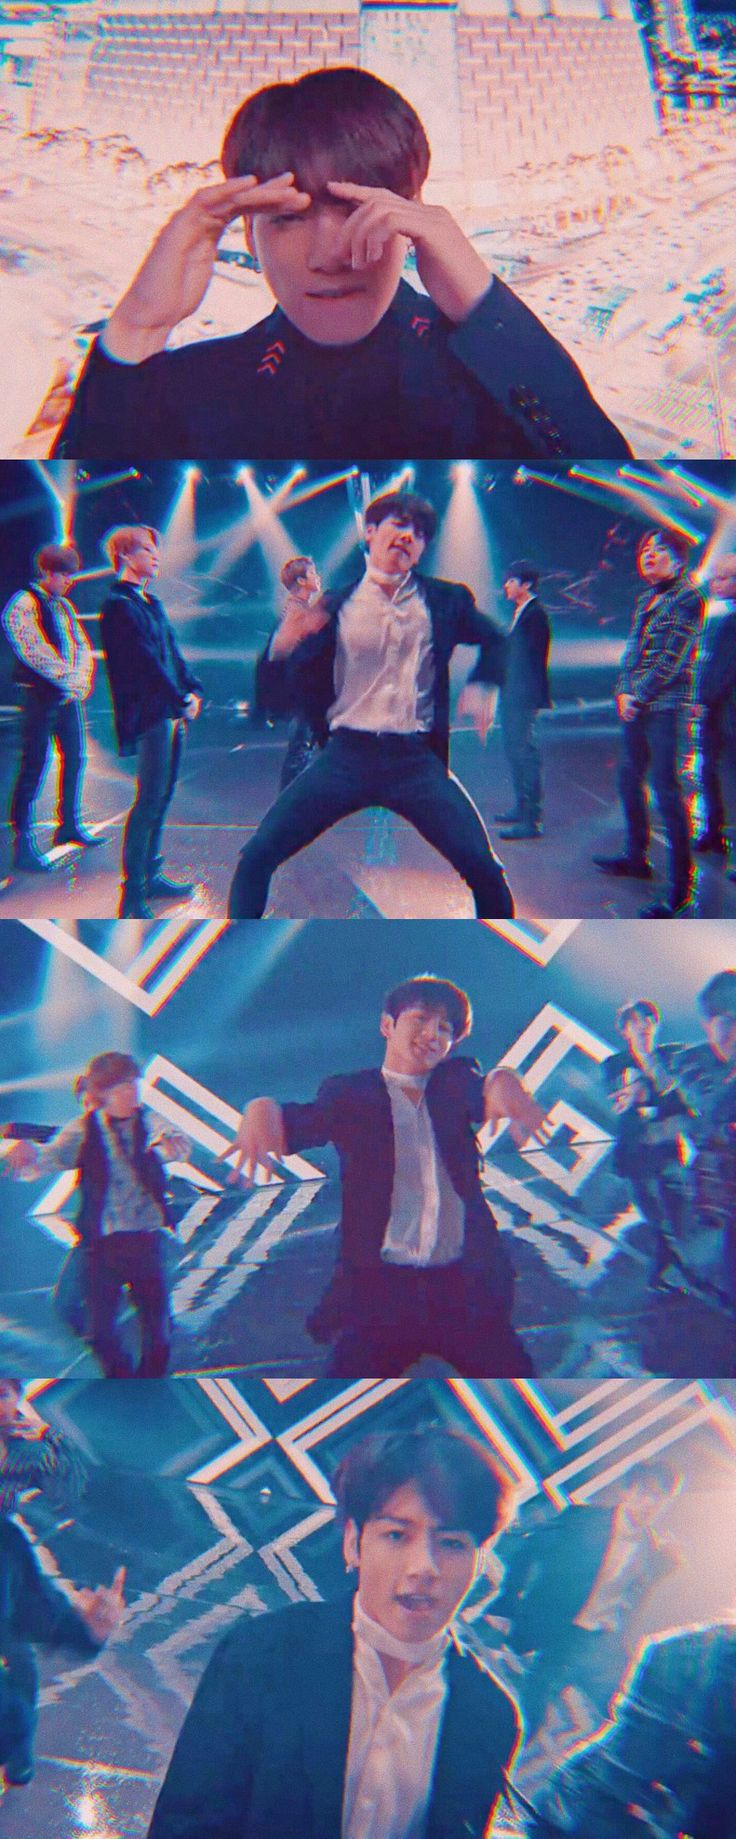 ʚ J K ɞ˒˒ Lotte Duty Free M/V #JUNGKOOK